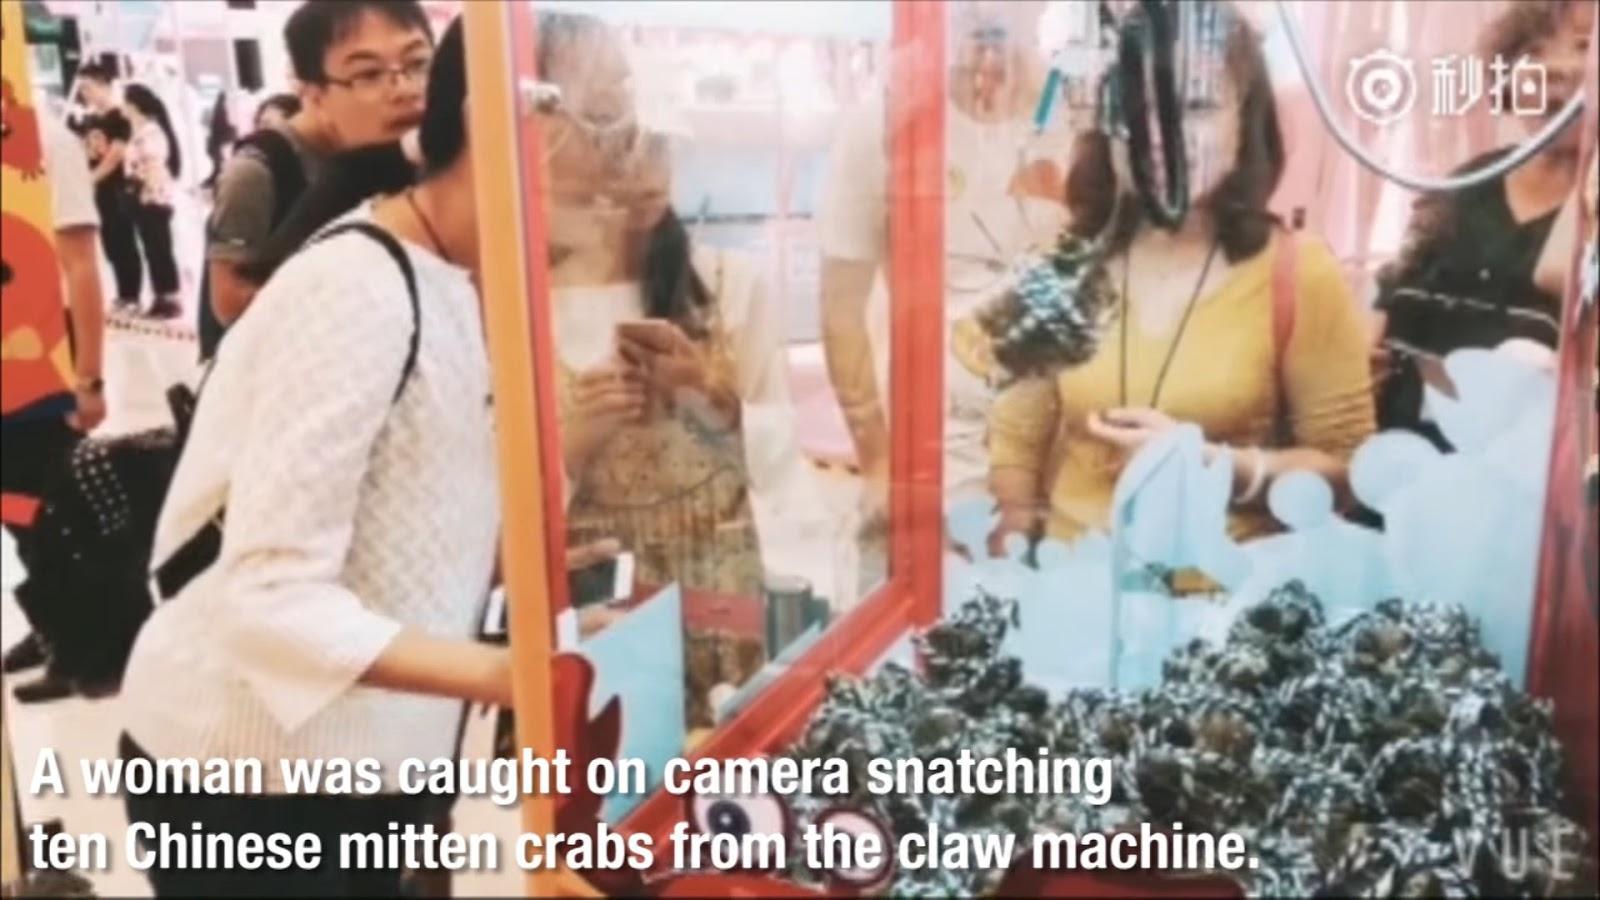 Grabbing ingredients for dinner at arcade shops.